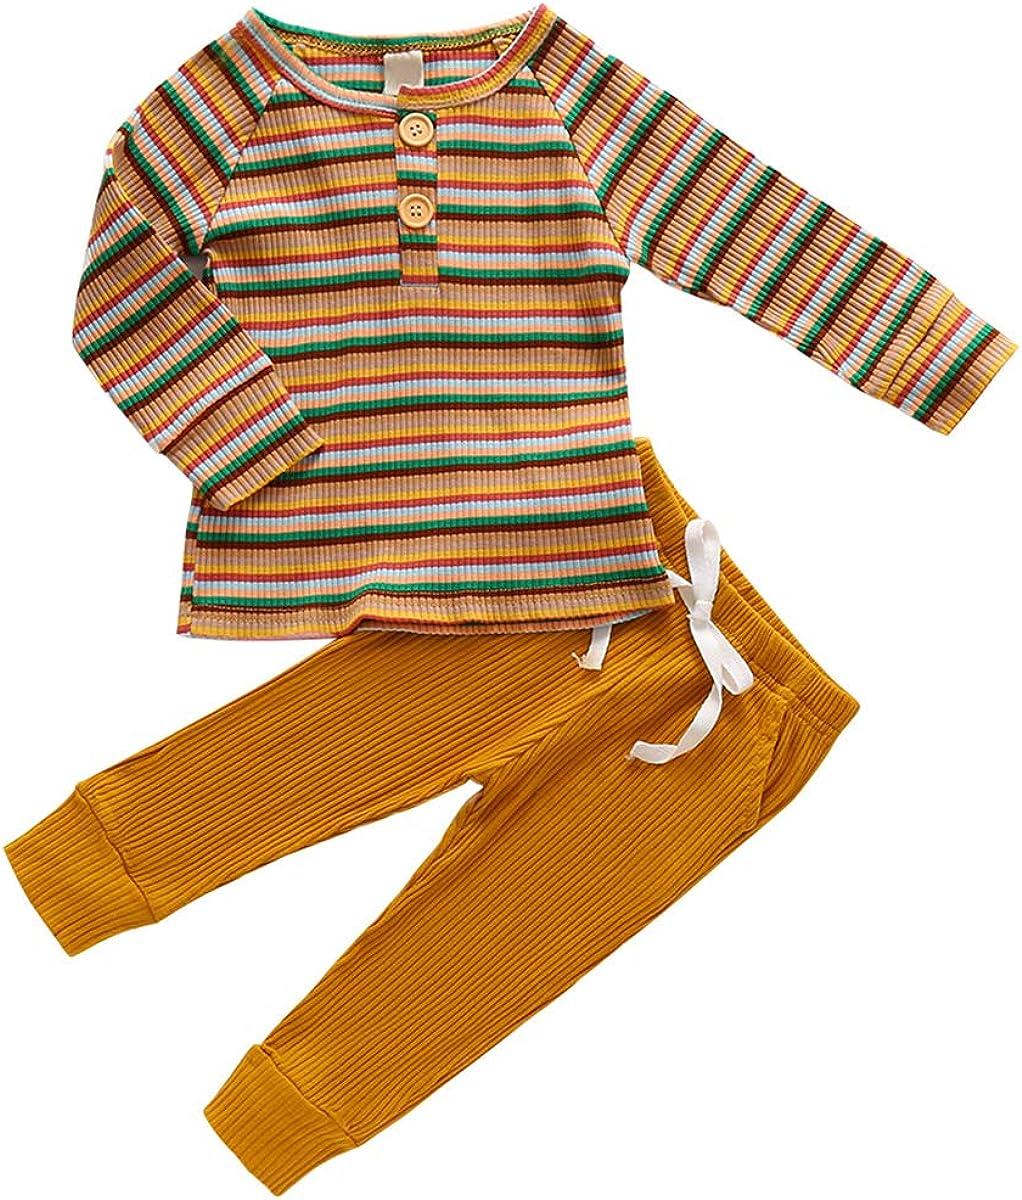 3pc baby boys outfit Baby boys outfit baby shower gift hospital take home- hey girl shirt baby stripe pants newborn boys outfit